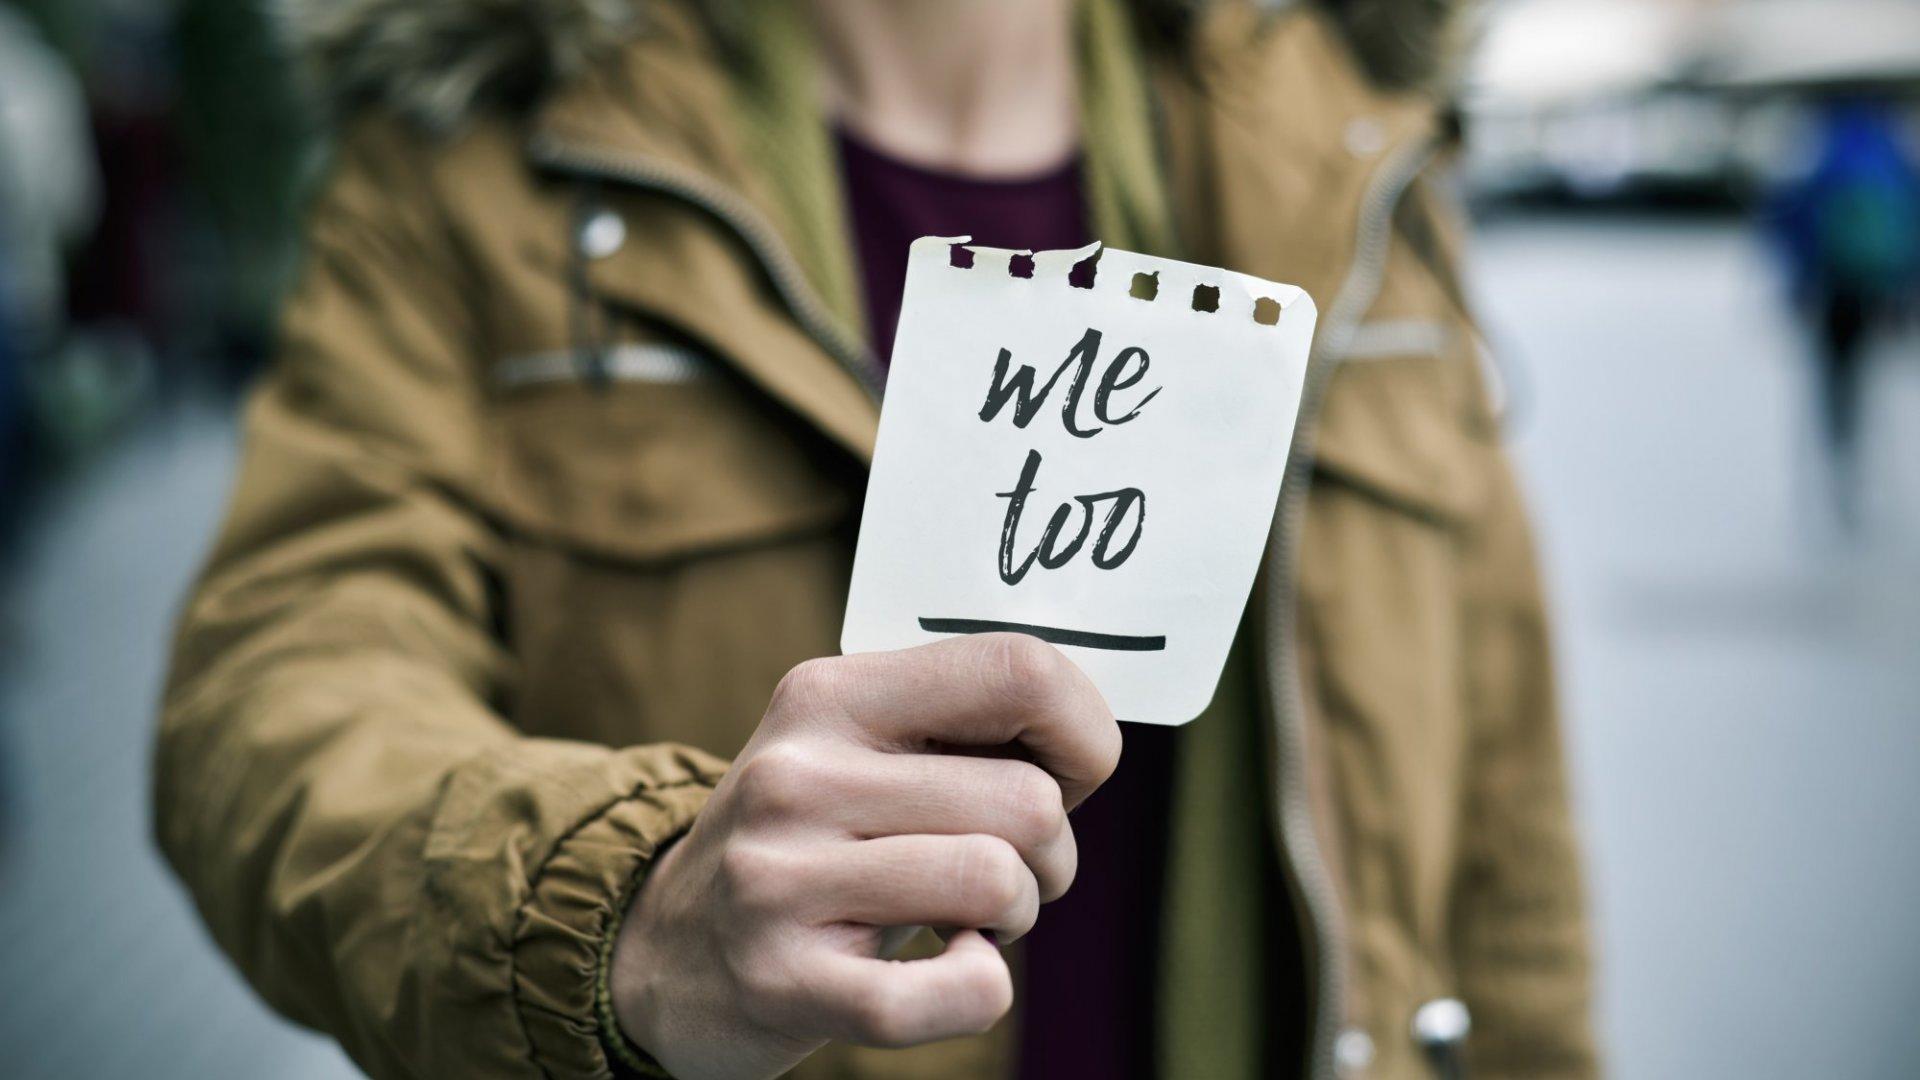 3 Ways to Combat Workplace Harrassment